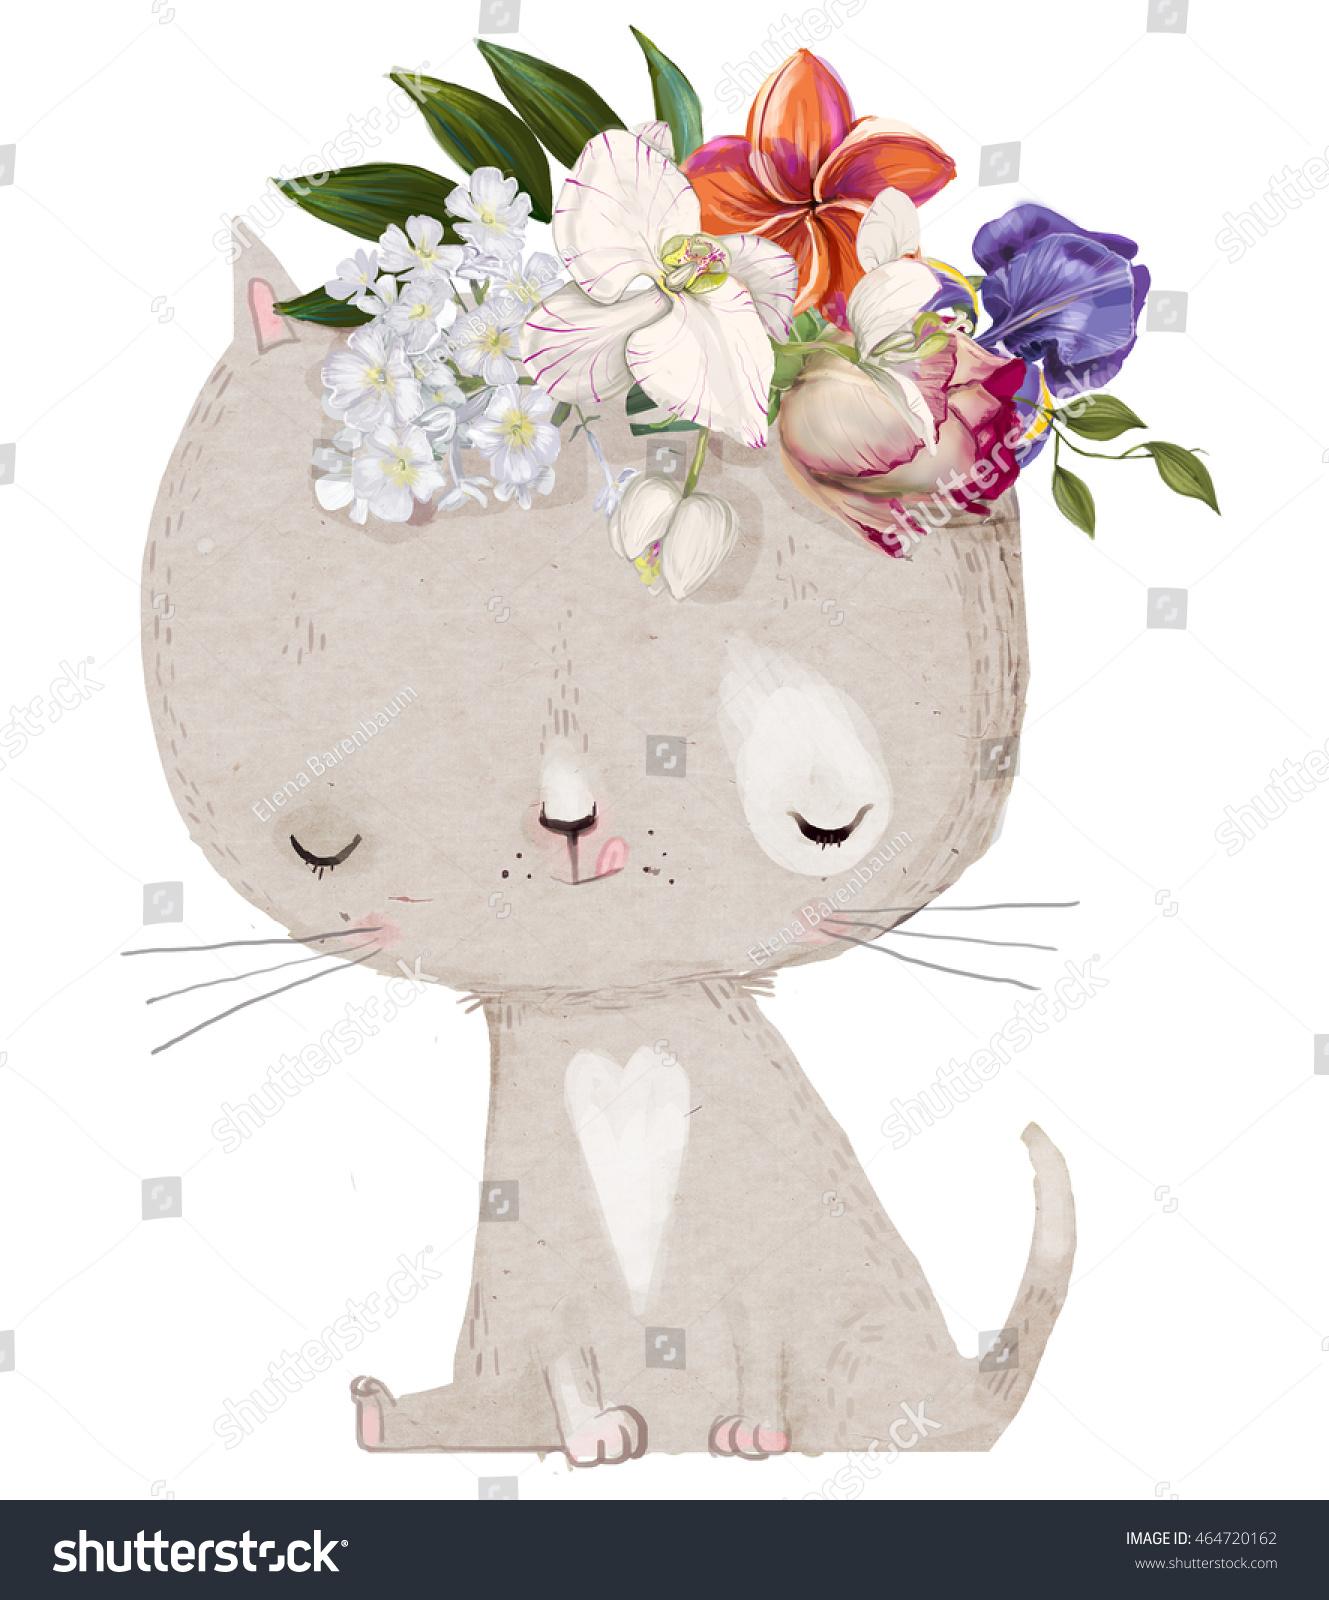 Cute Hand Drawn Kitten Floral Wreath Stock Illustration 464720162 ...